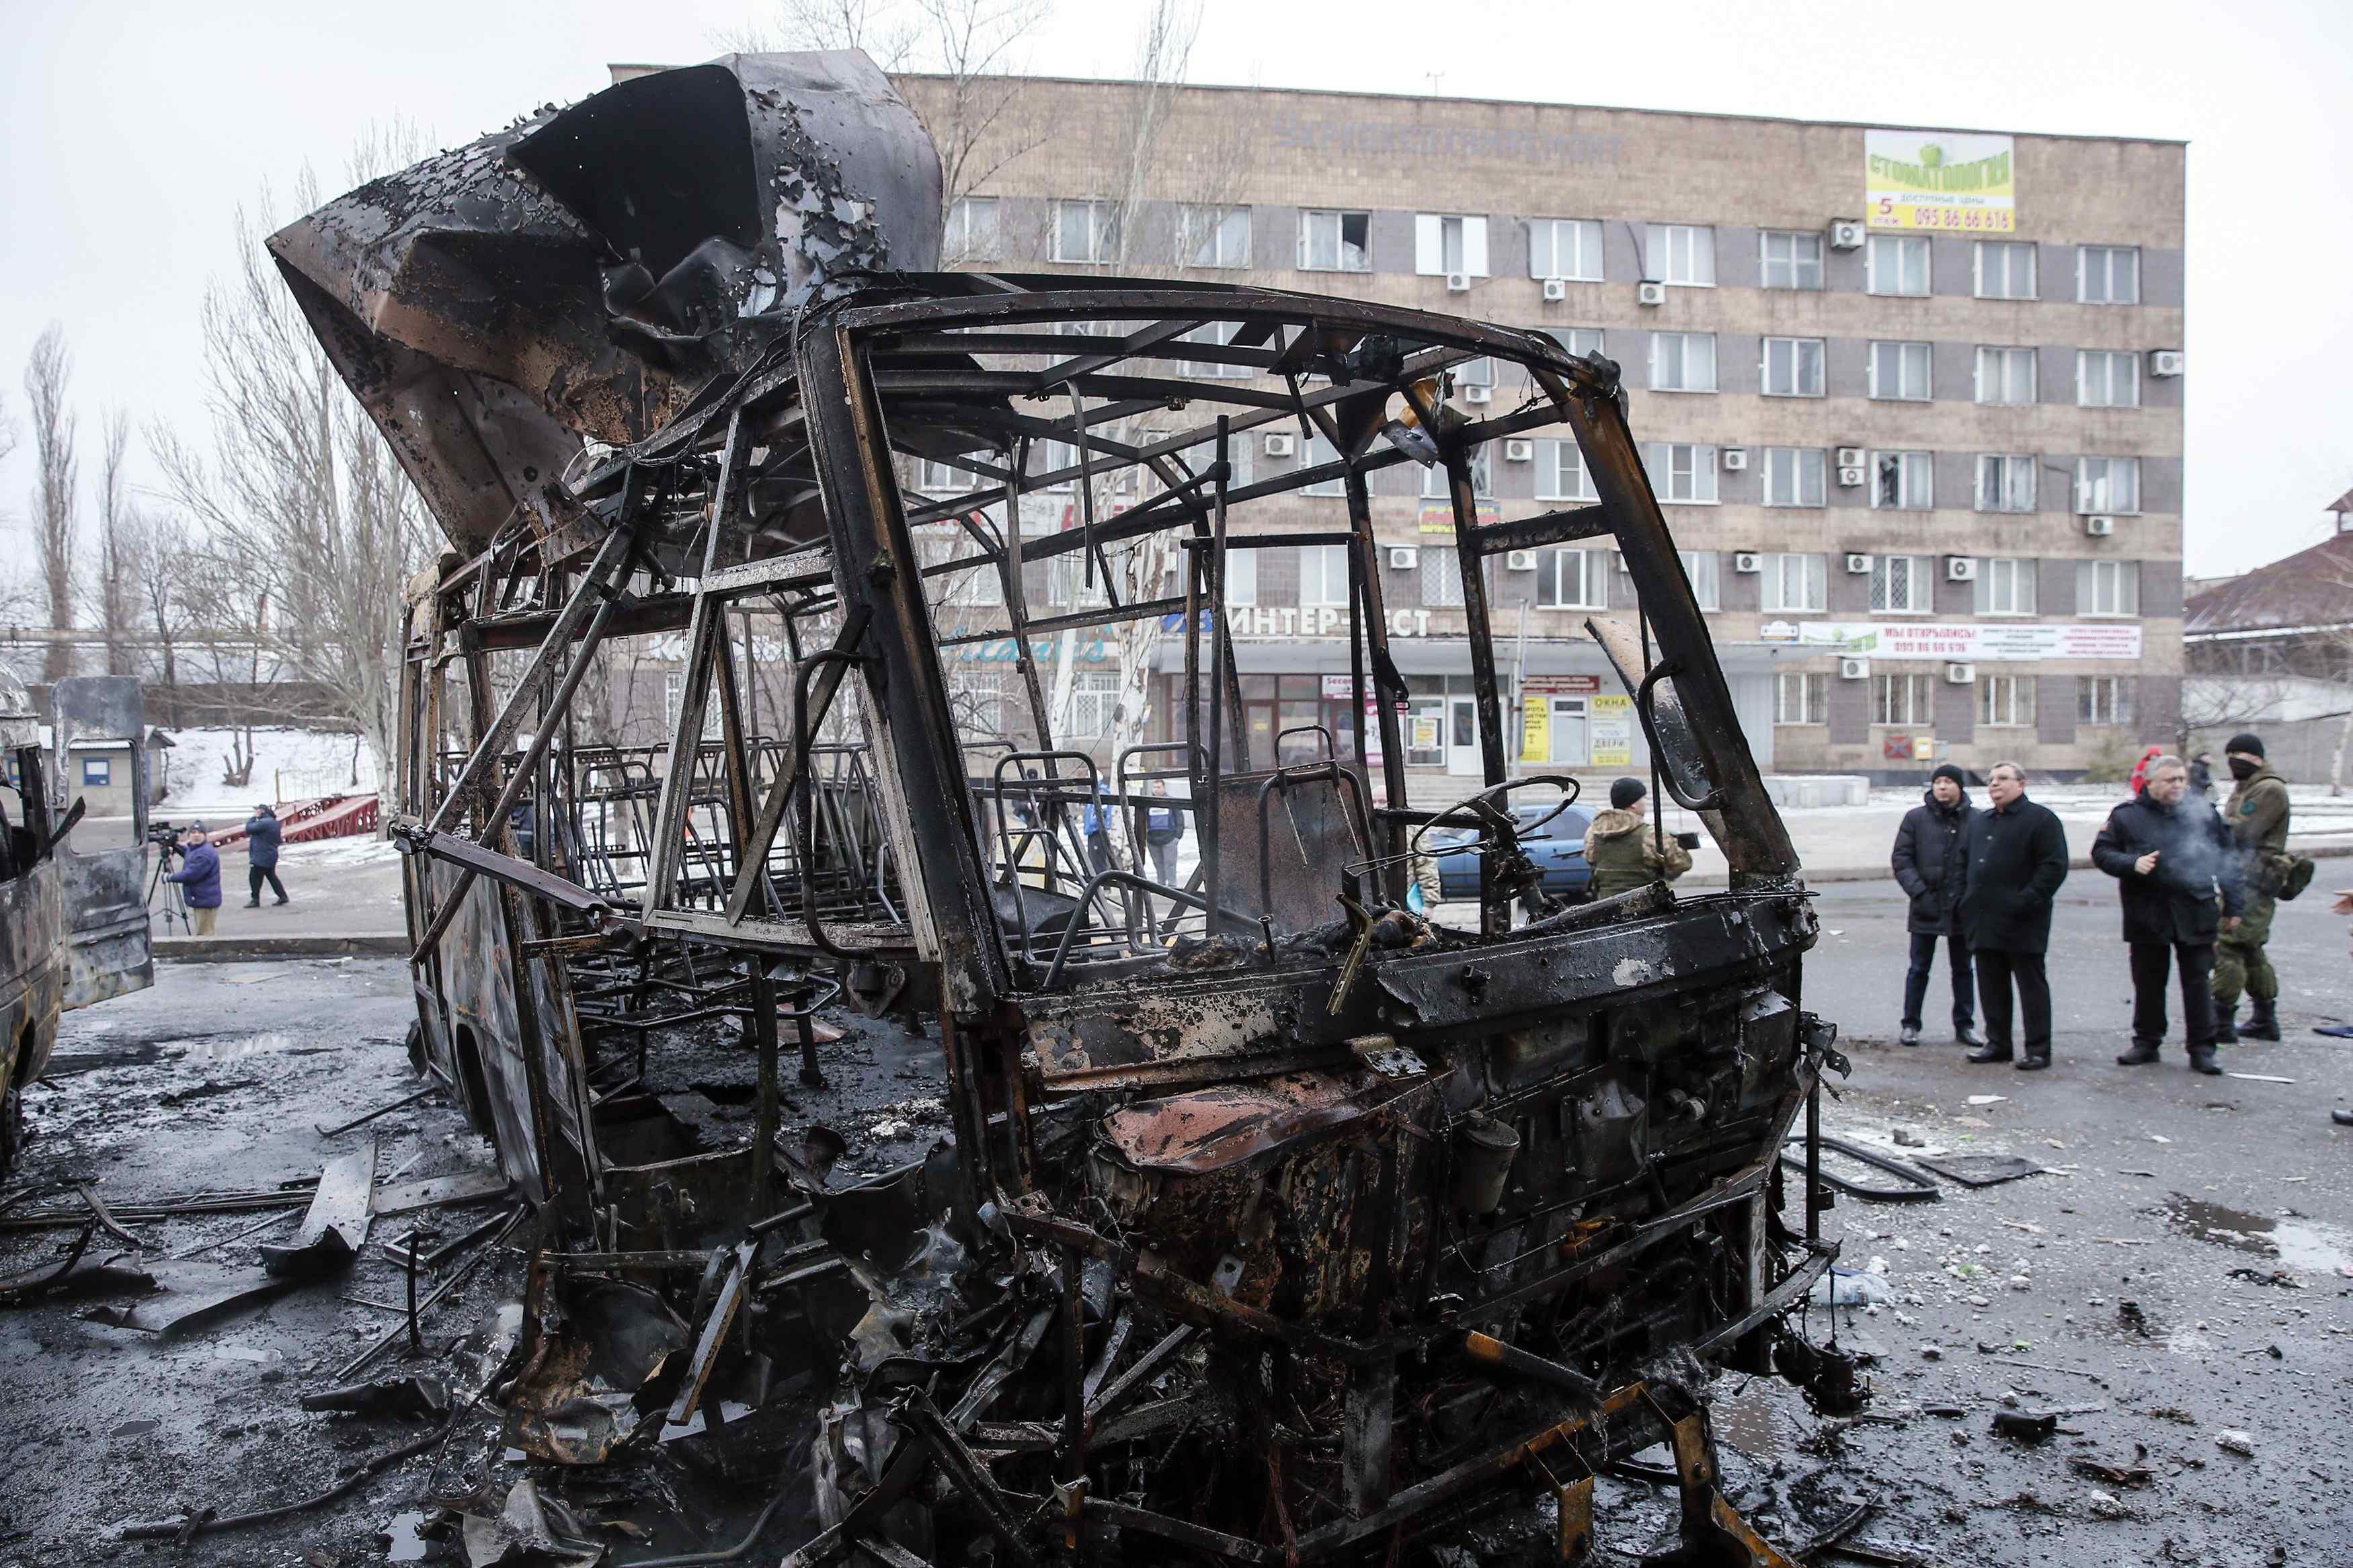 Rebel attacks kill 19 Ukrainian soldiers near rail junction in east - Kiev military